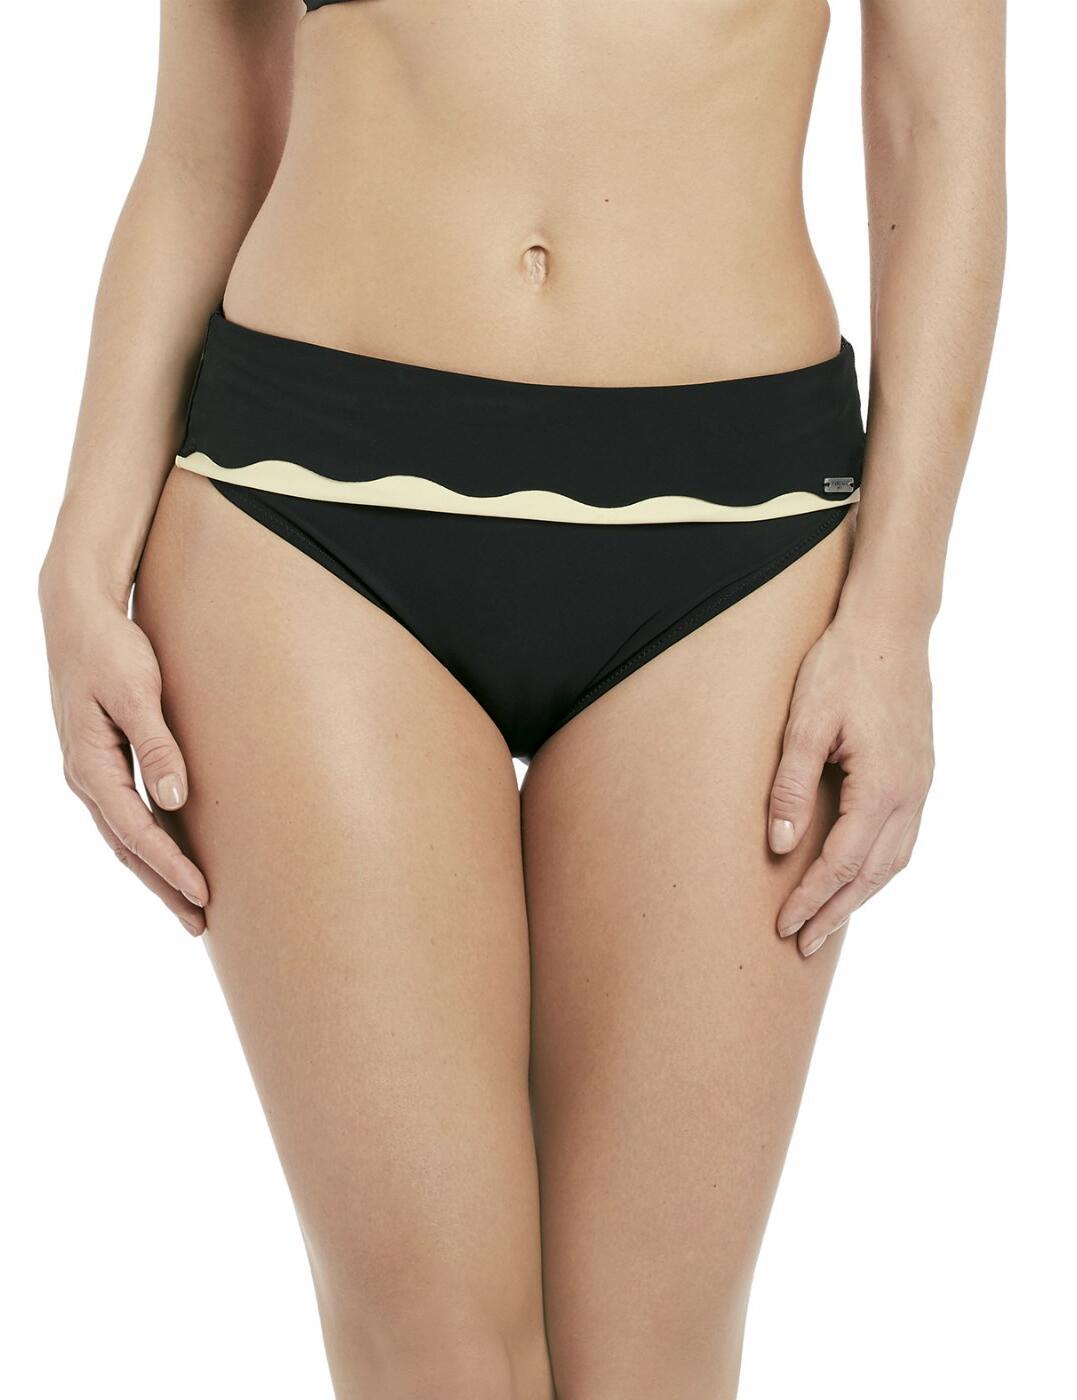 6235 Fantasie Sainte Maxime Fold Over Bikini Brief - 6235 Black/Cream